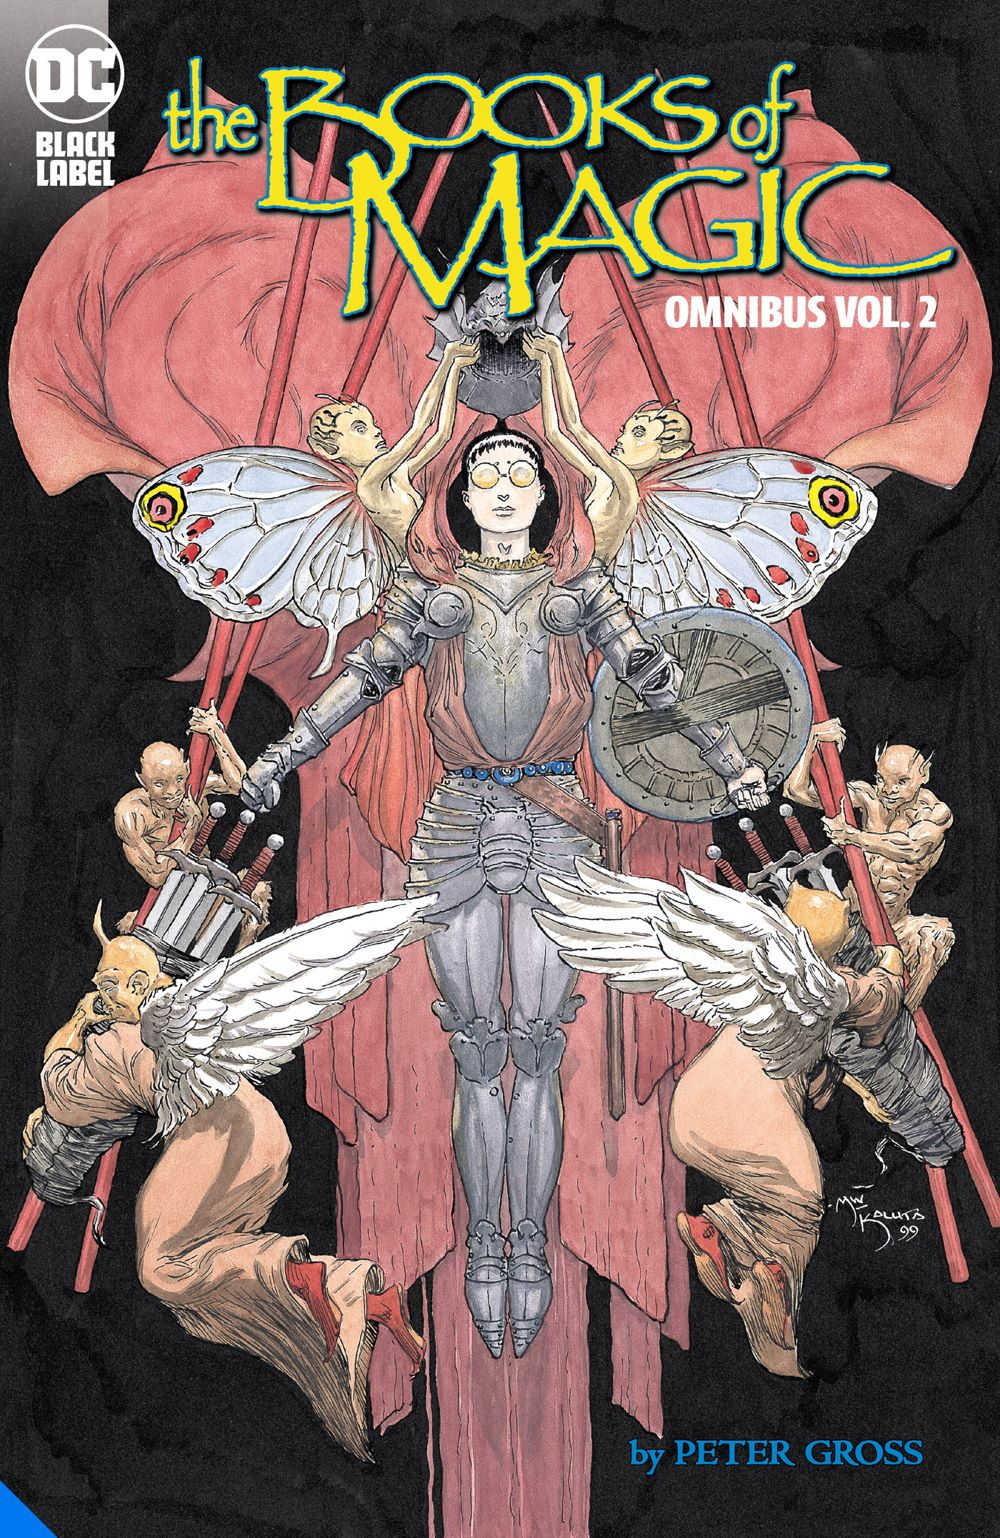 booksofmagic-vol2-omni_adv DC Comics August 2021 Solicitations